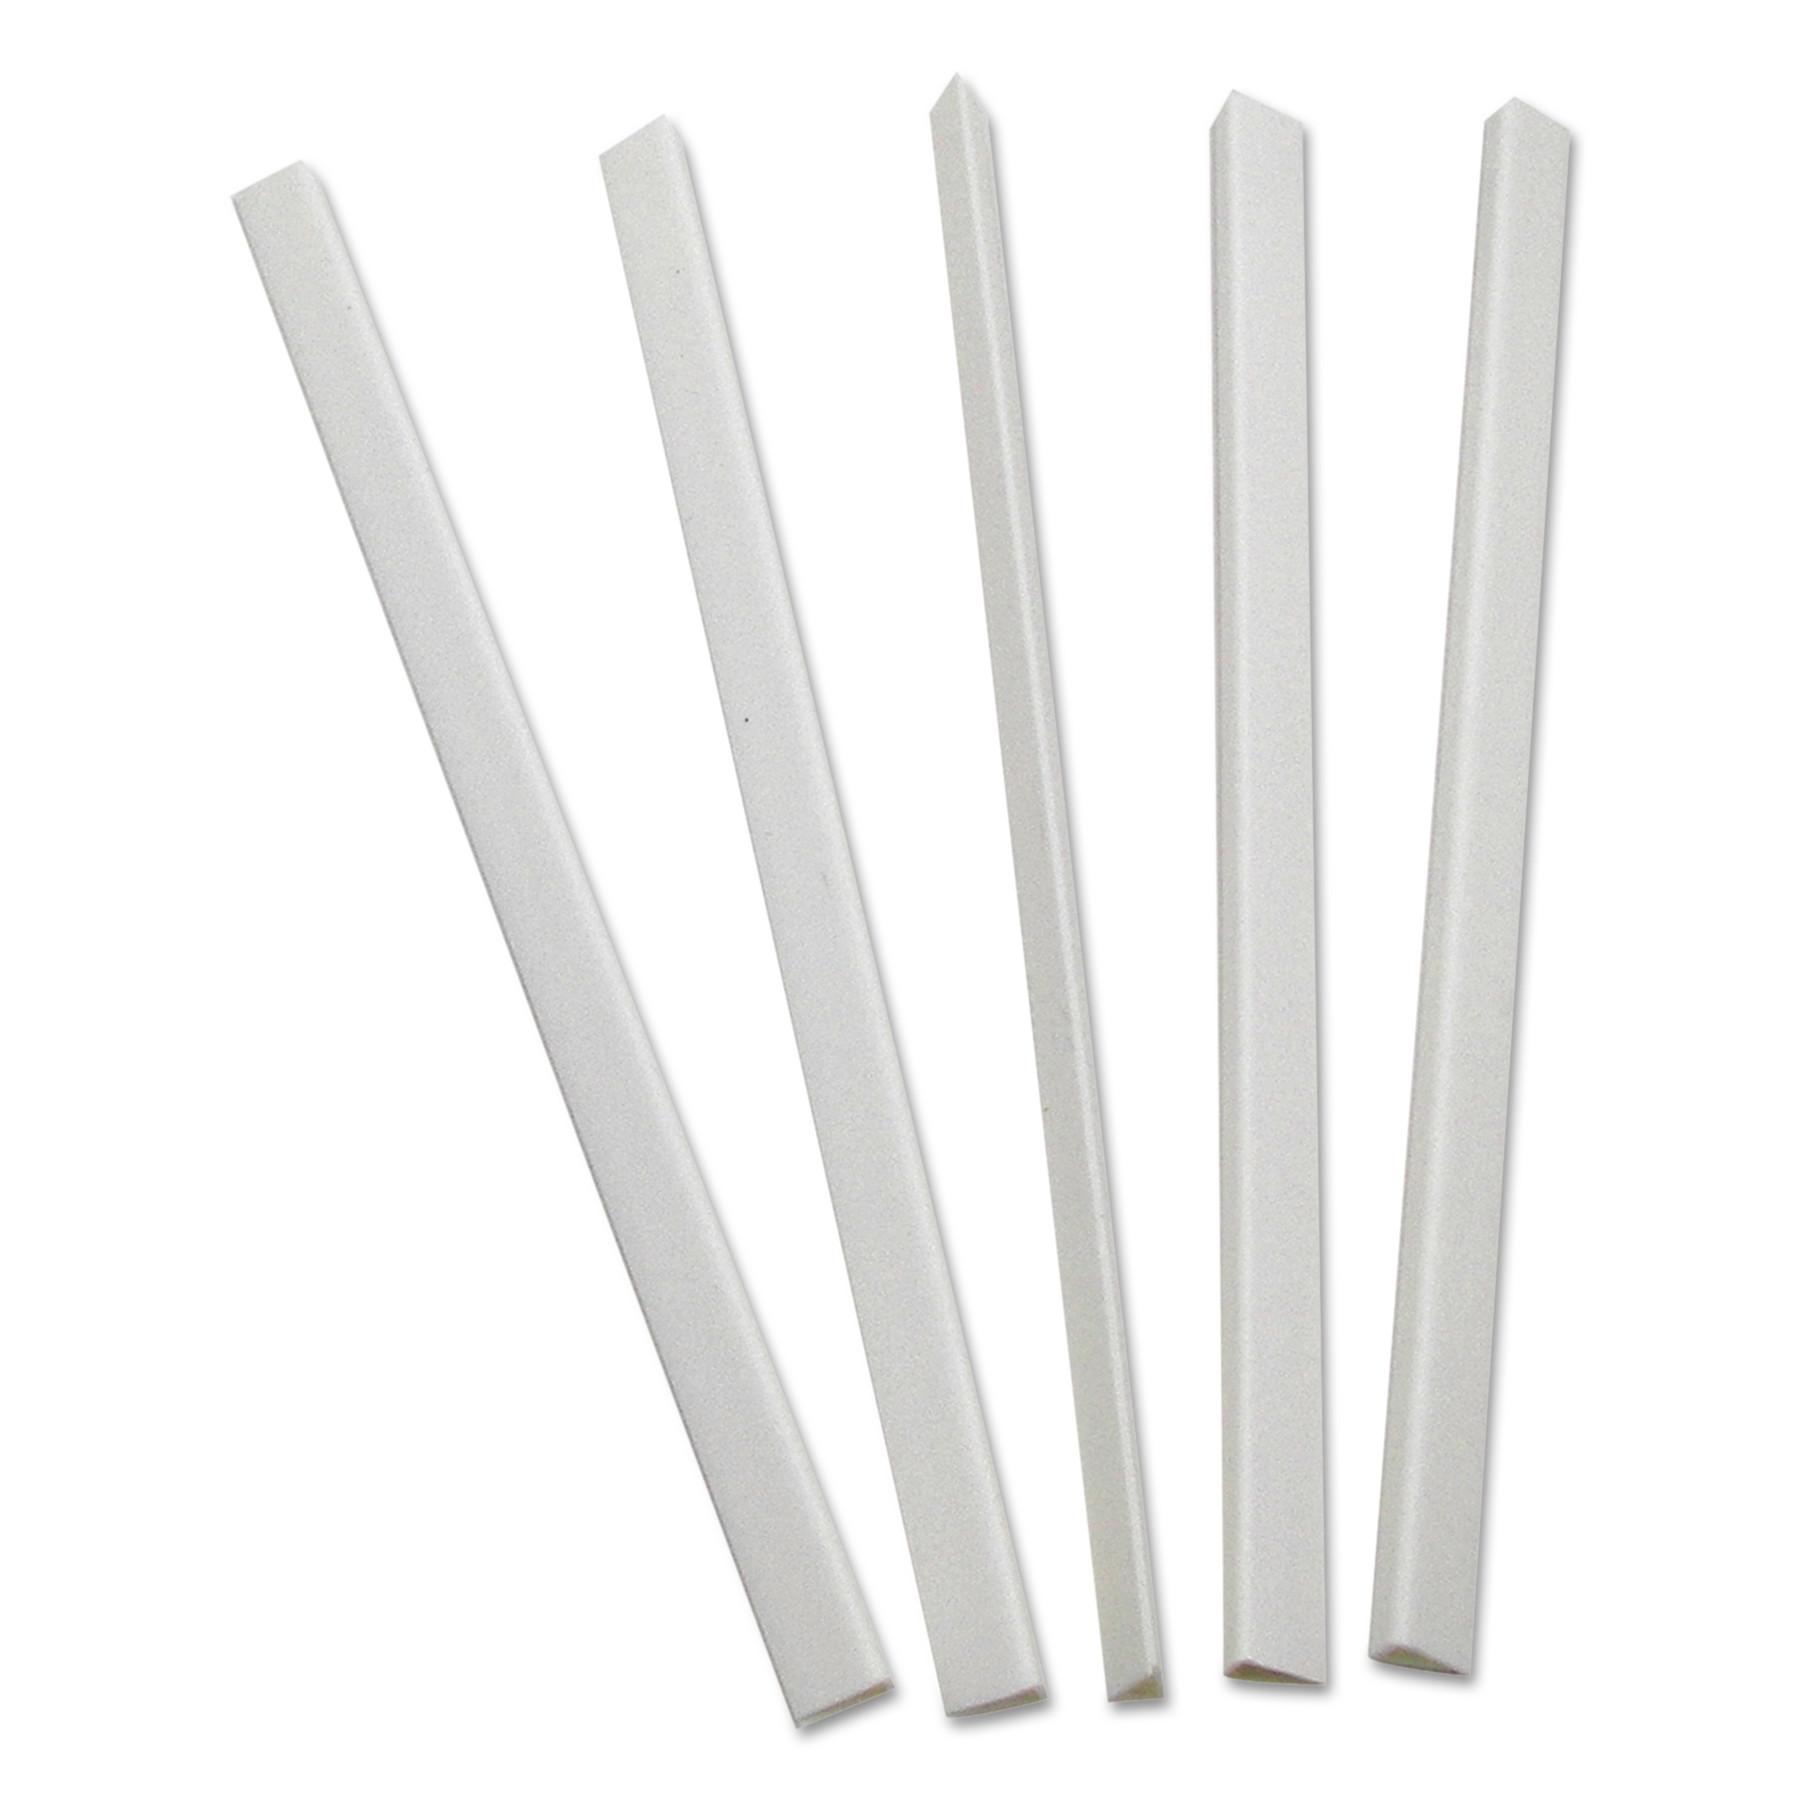 Slide 'N Grip Binding Bars, White, 11 x 1/4, 100/Box